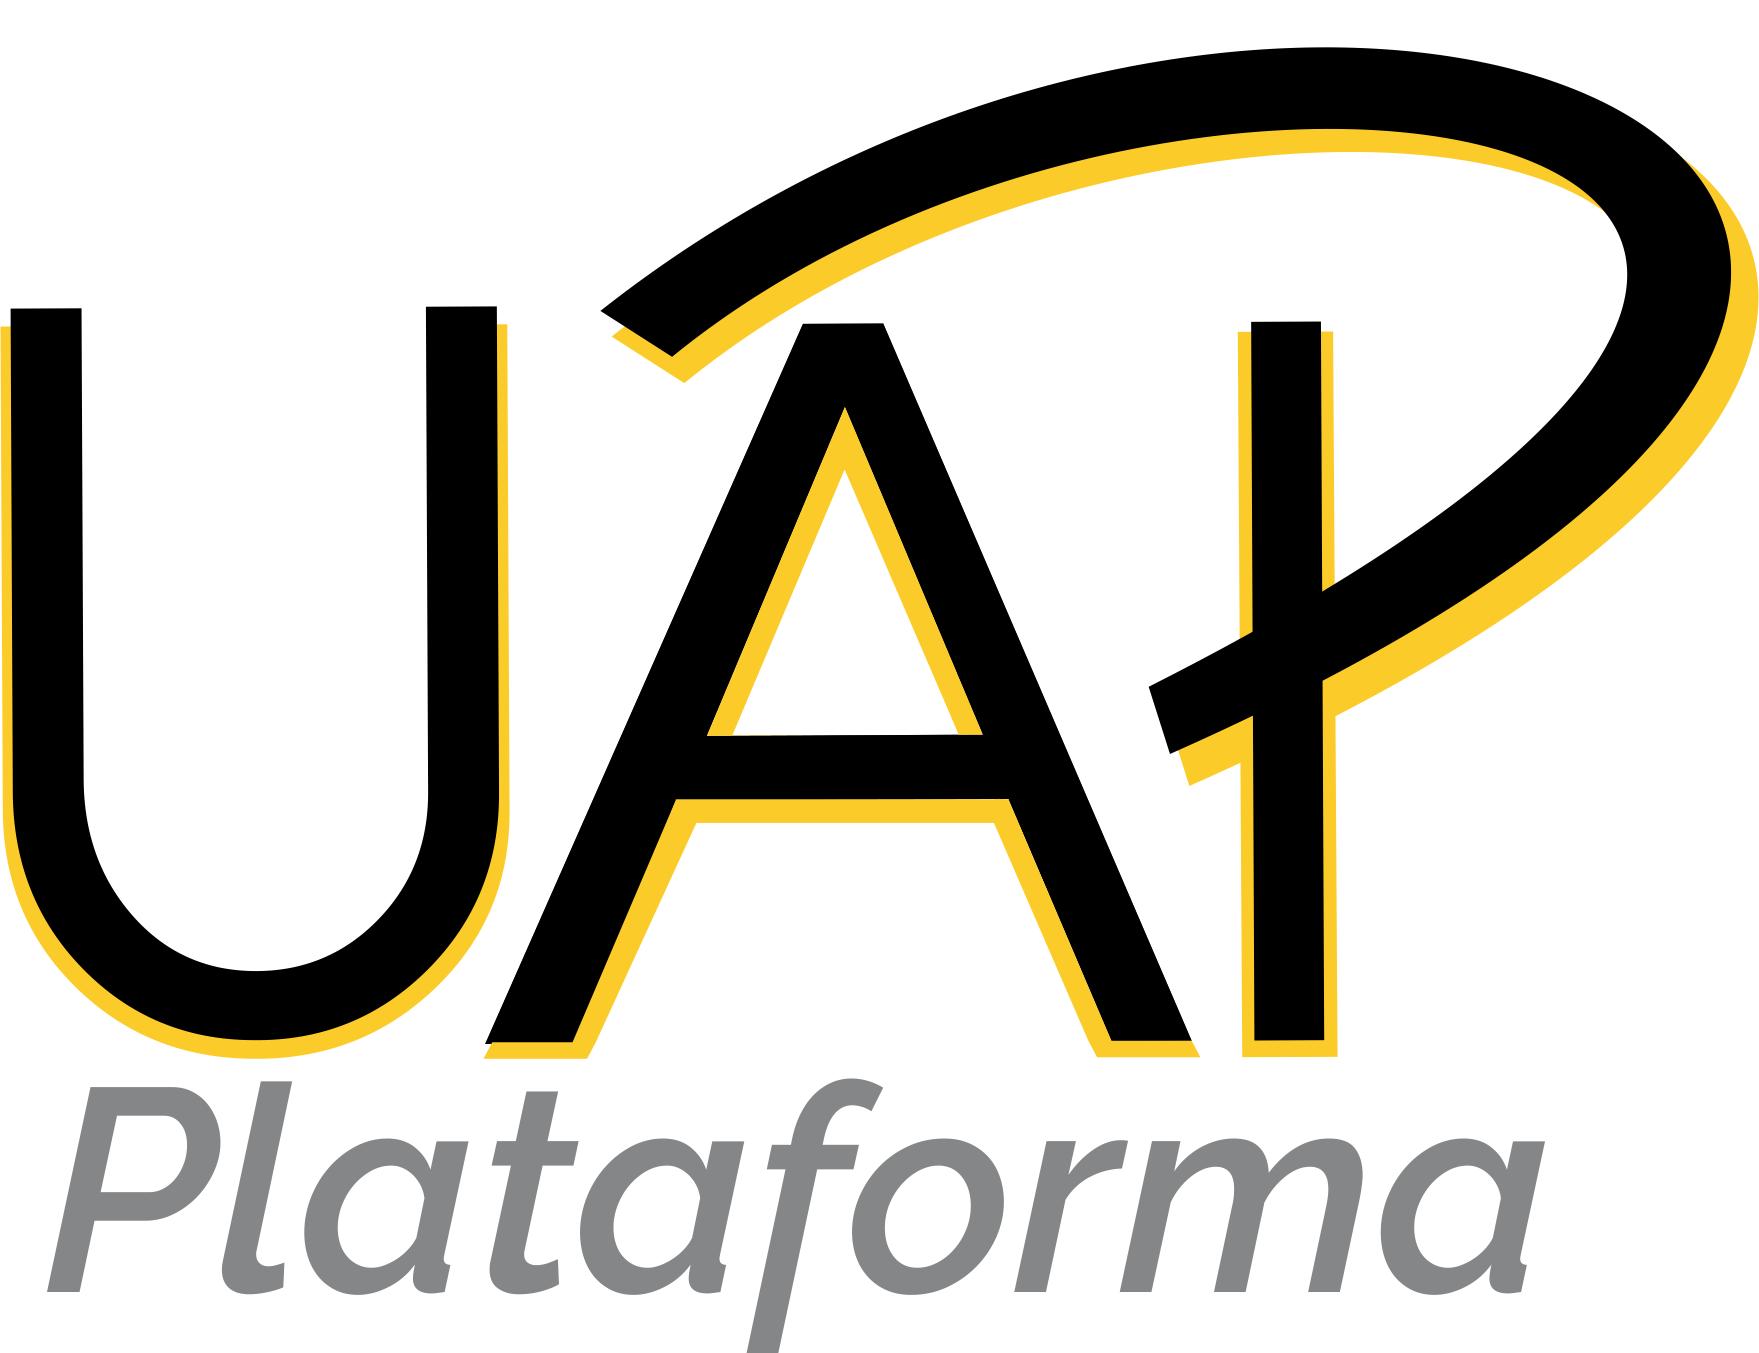 PLATAFORM